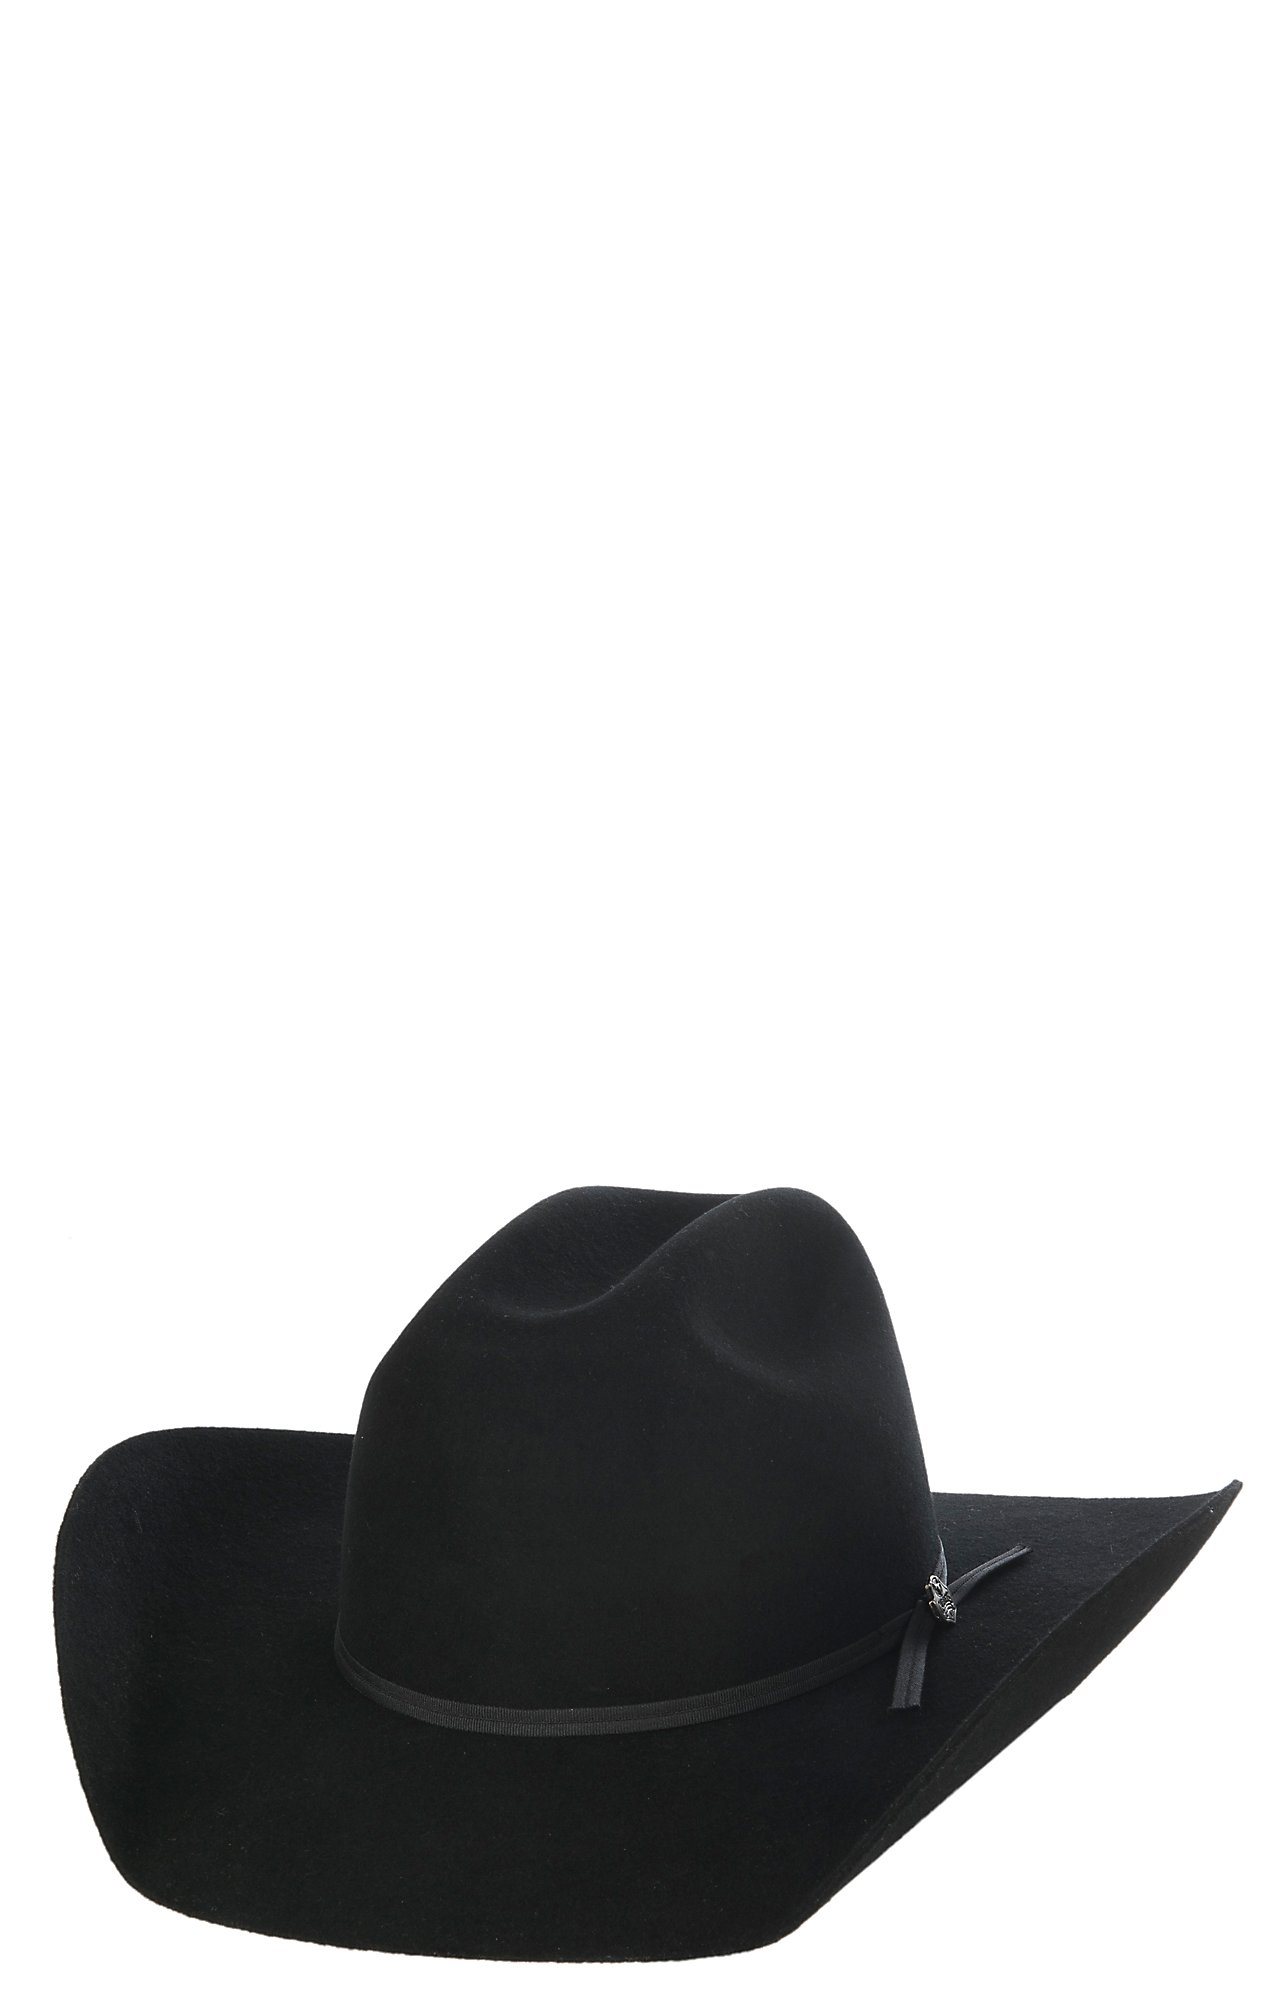 e35686e9189 Cavender s Kids 2X Black Cattleman Crown Felt Cowboy Hat